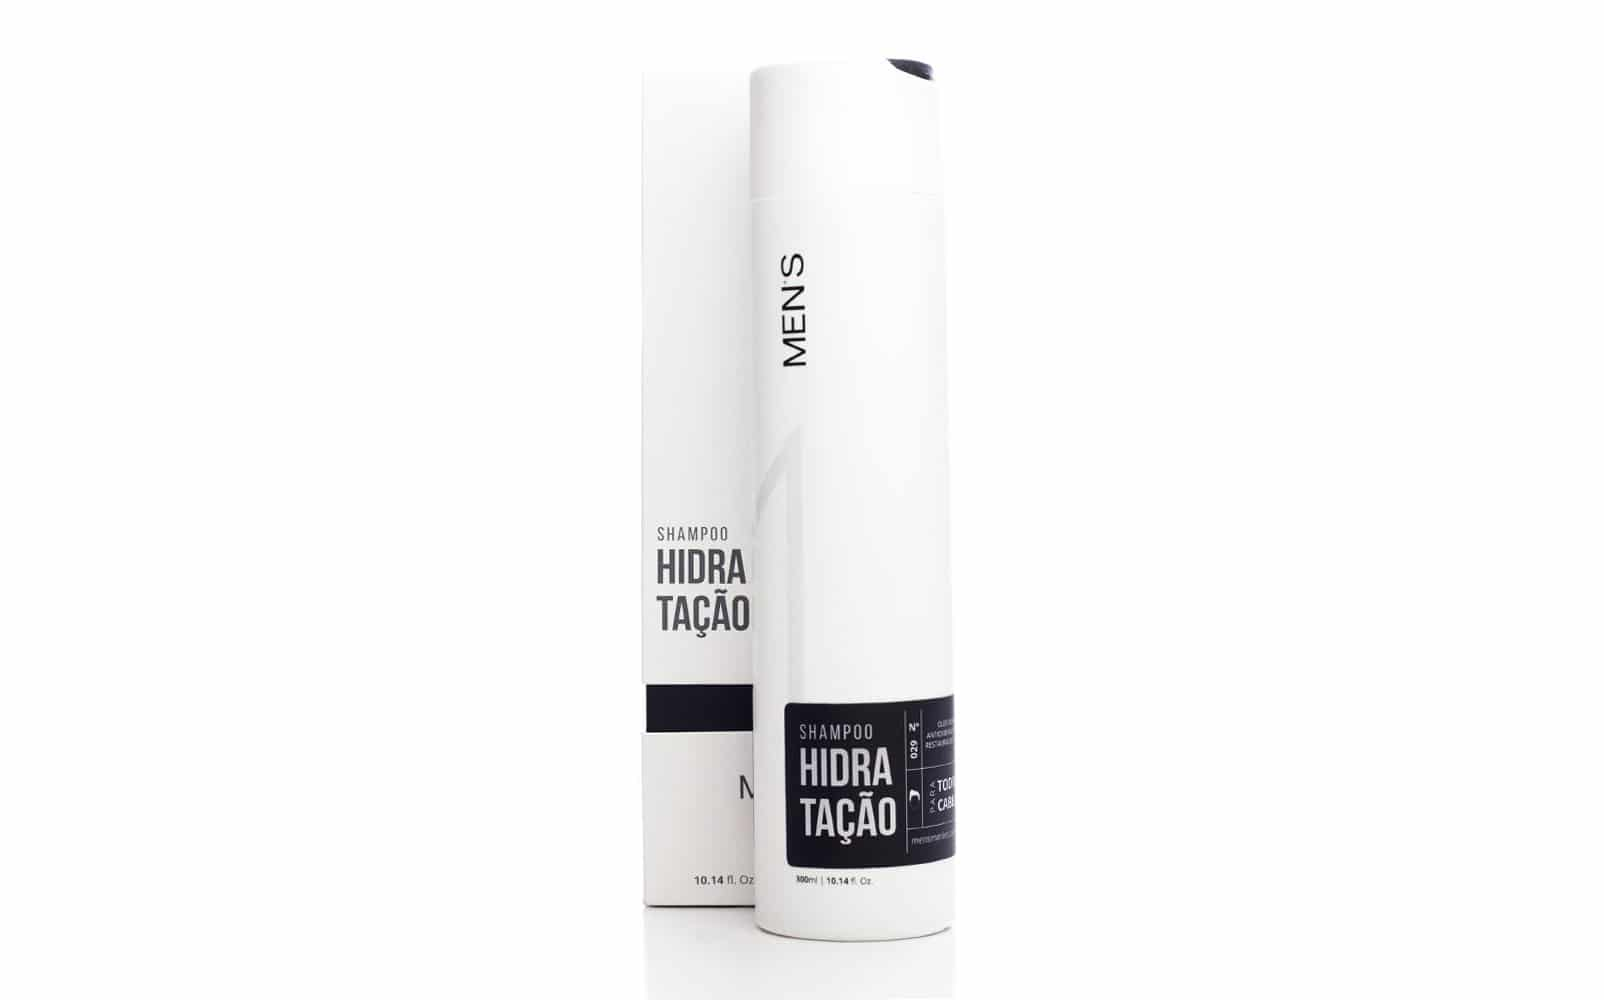 shampoo ideal fios secos pro hidratacao Mens homens que se cuidam